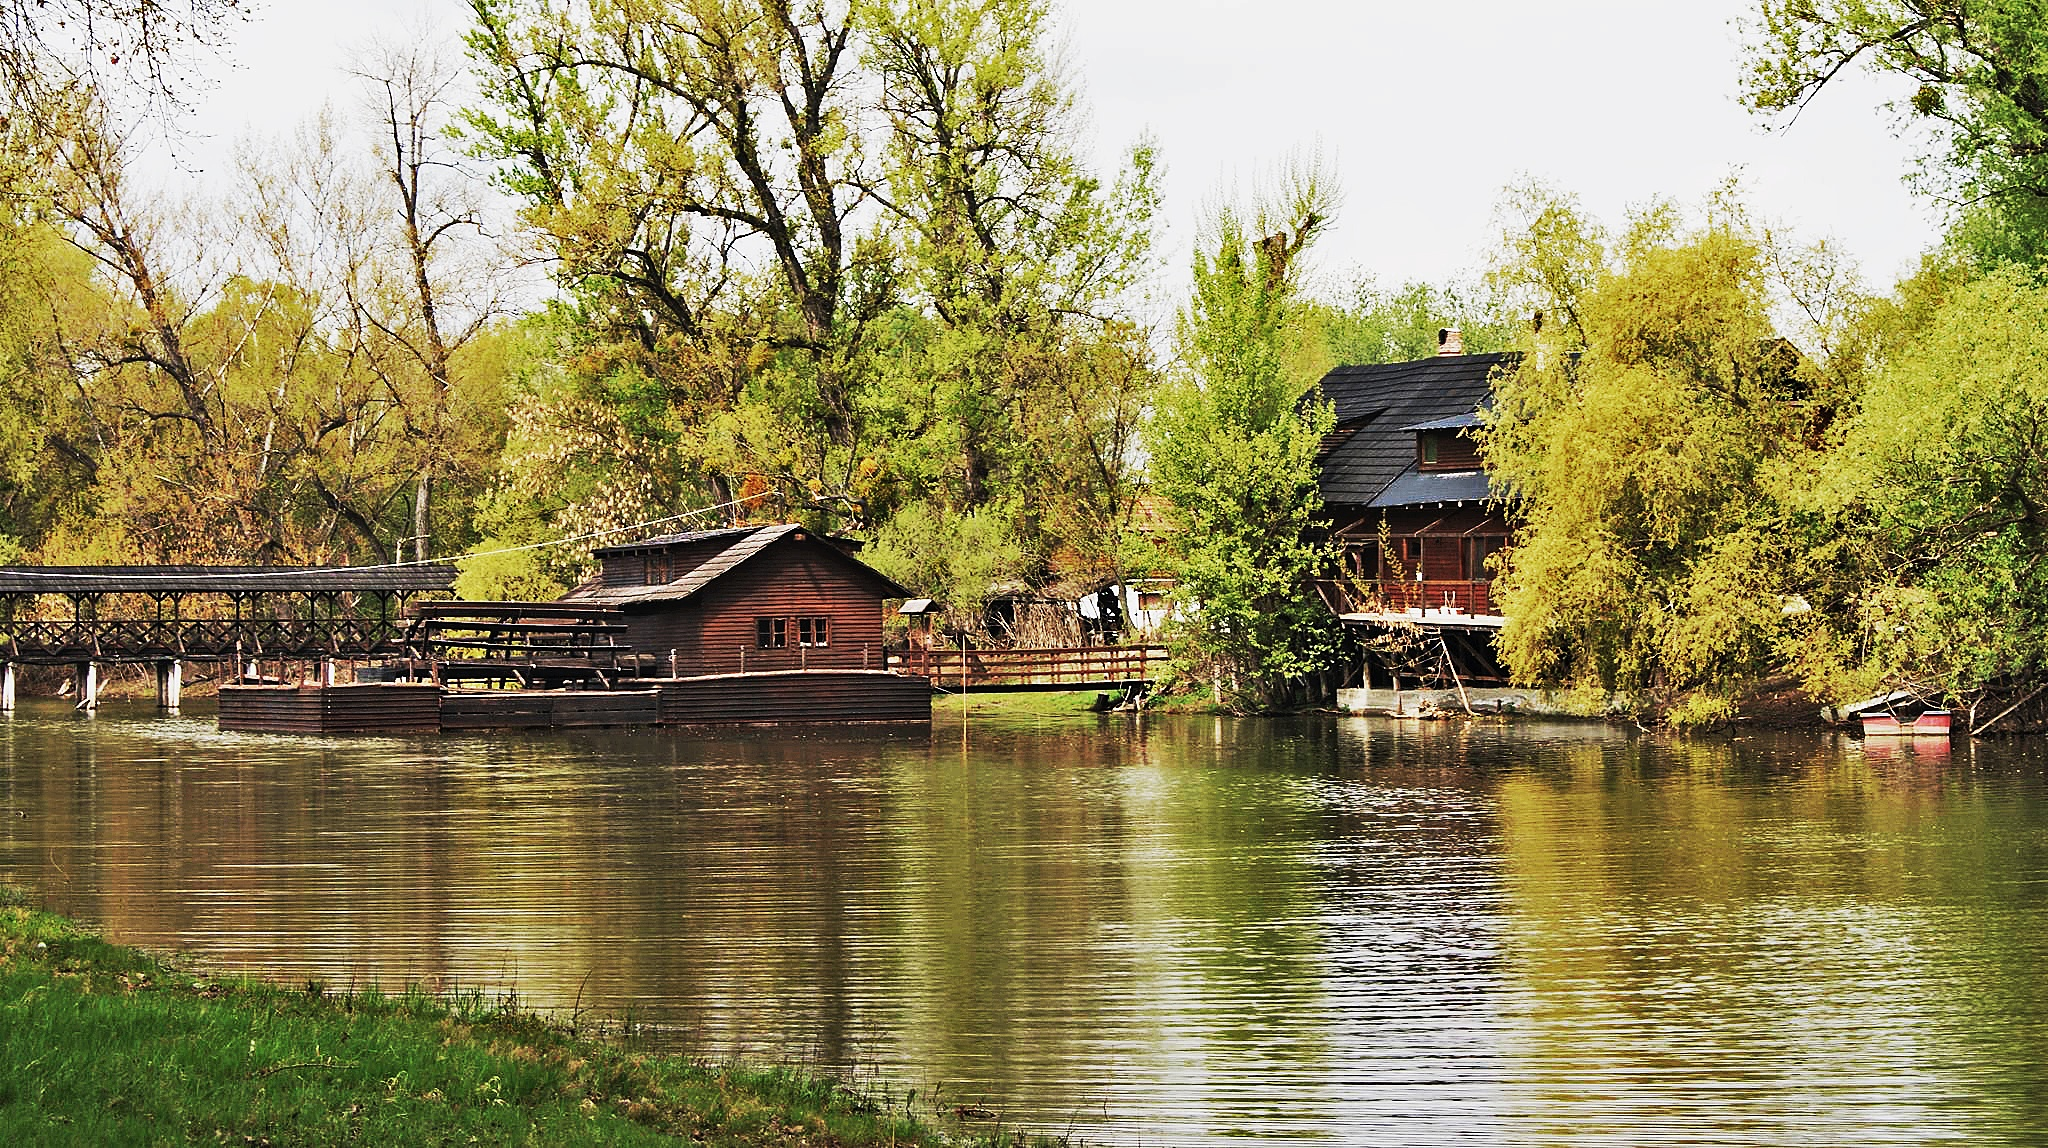 water mill Kolarovo (my hometown) by FF Photo ( ferencfuri)